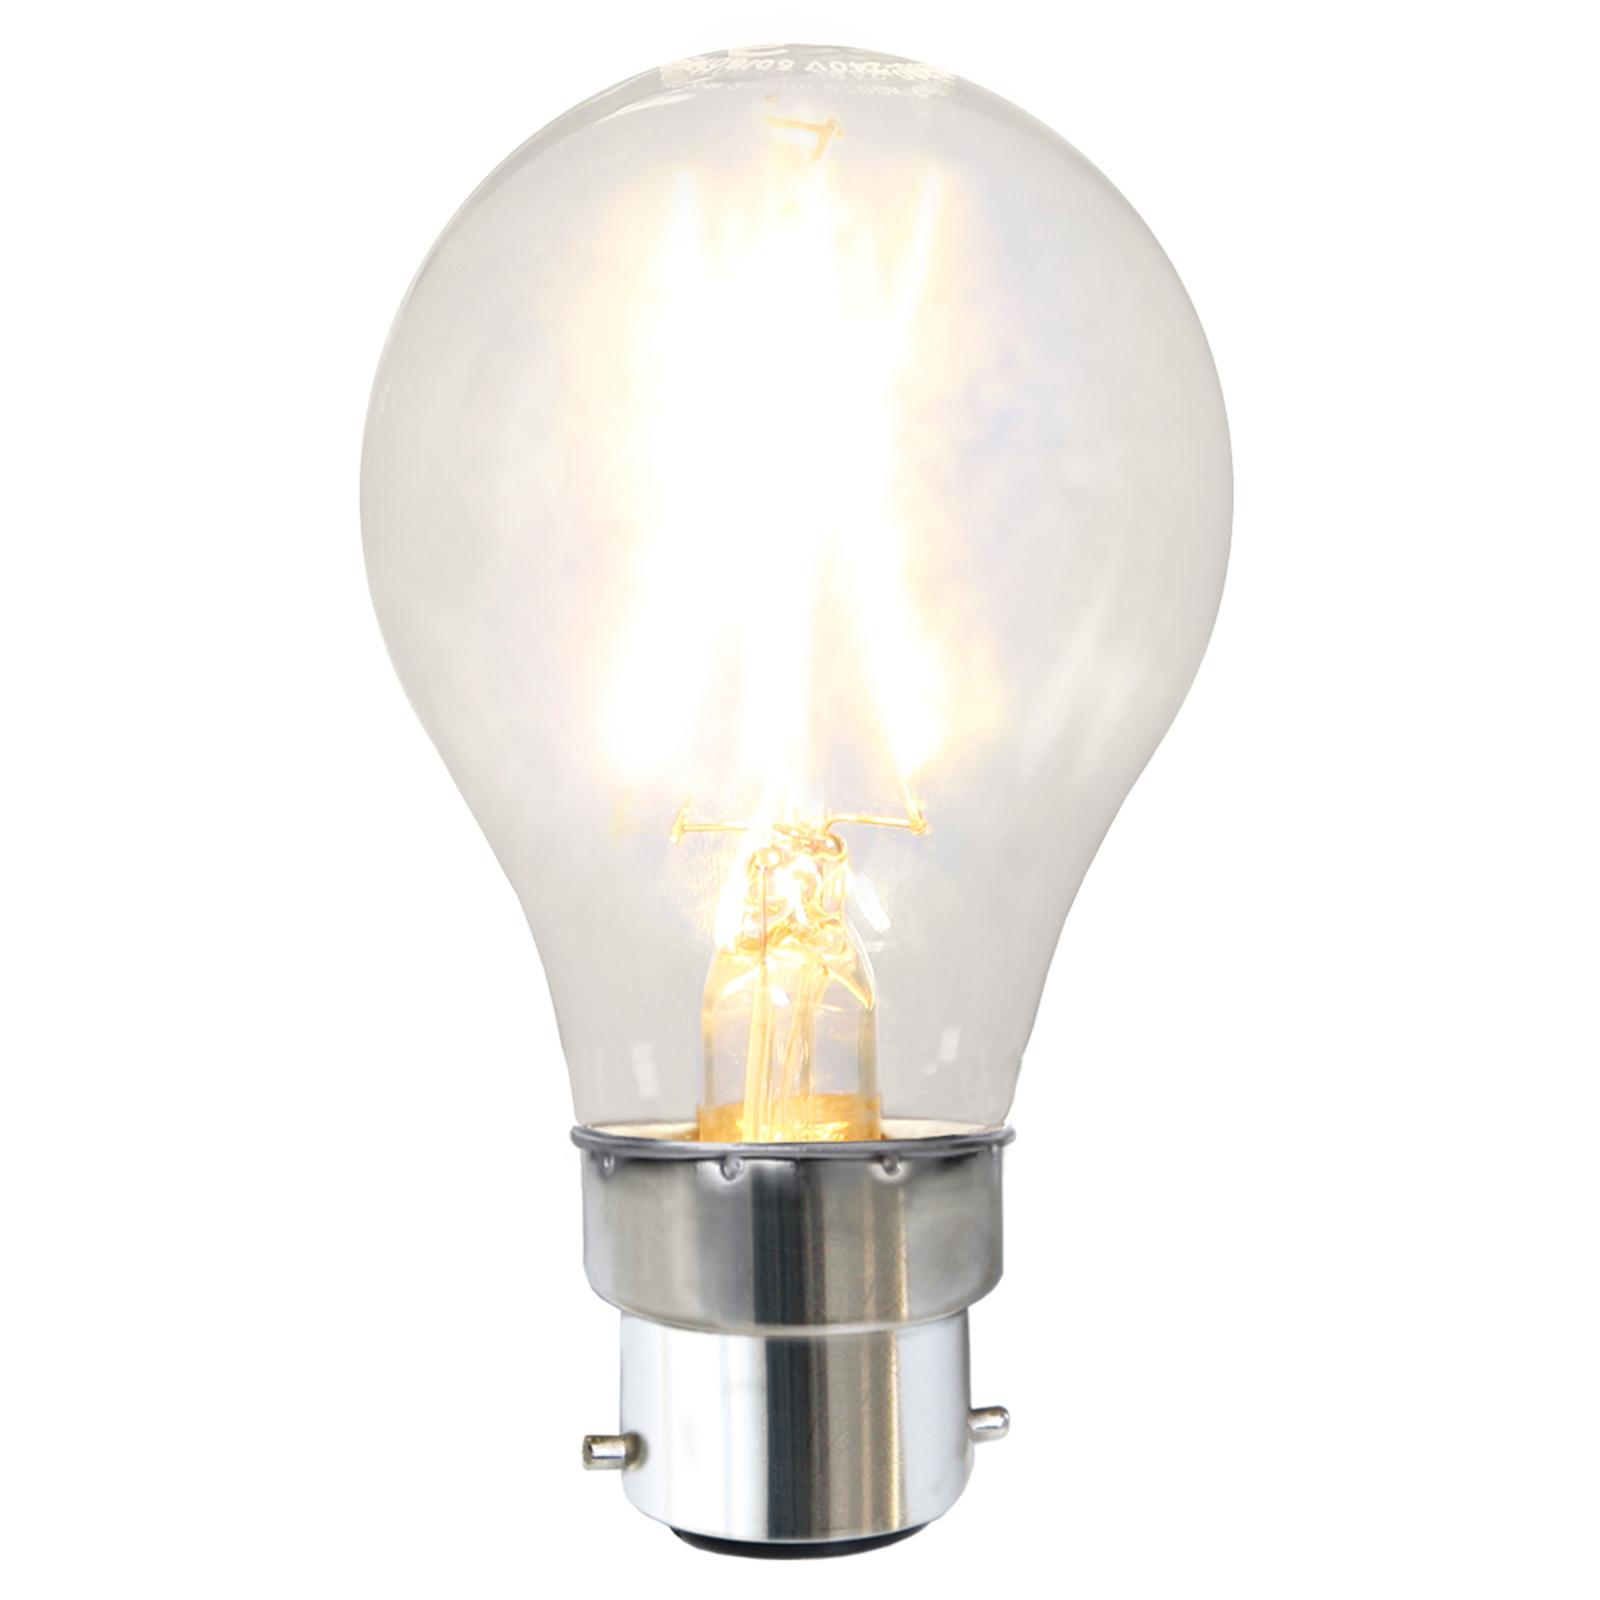 B22 1,6W LED-Lampe, warmweiß